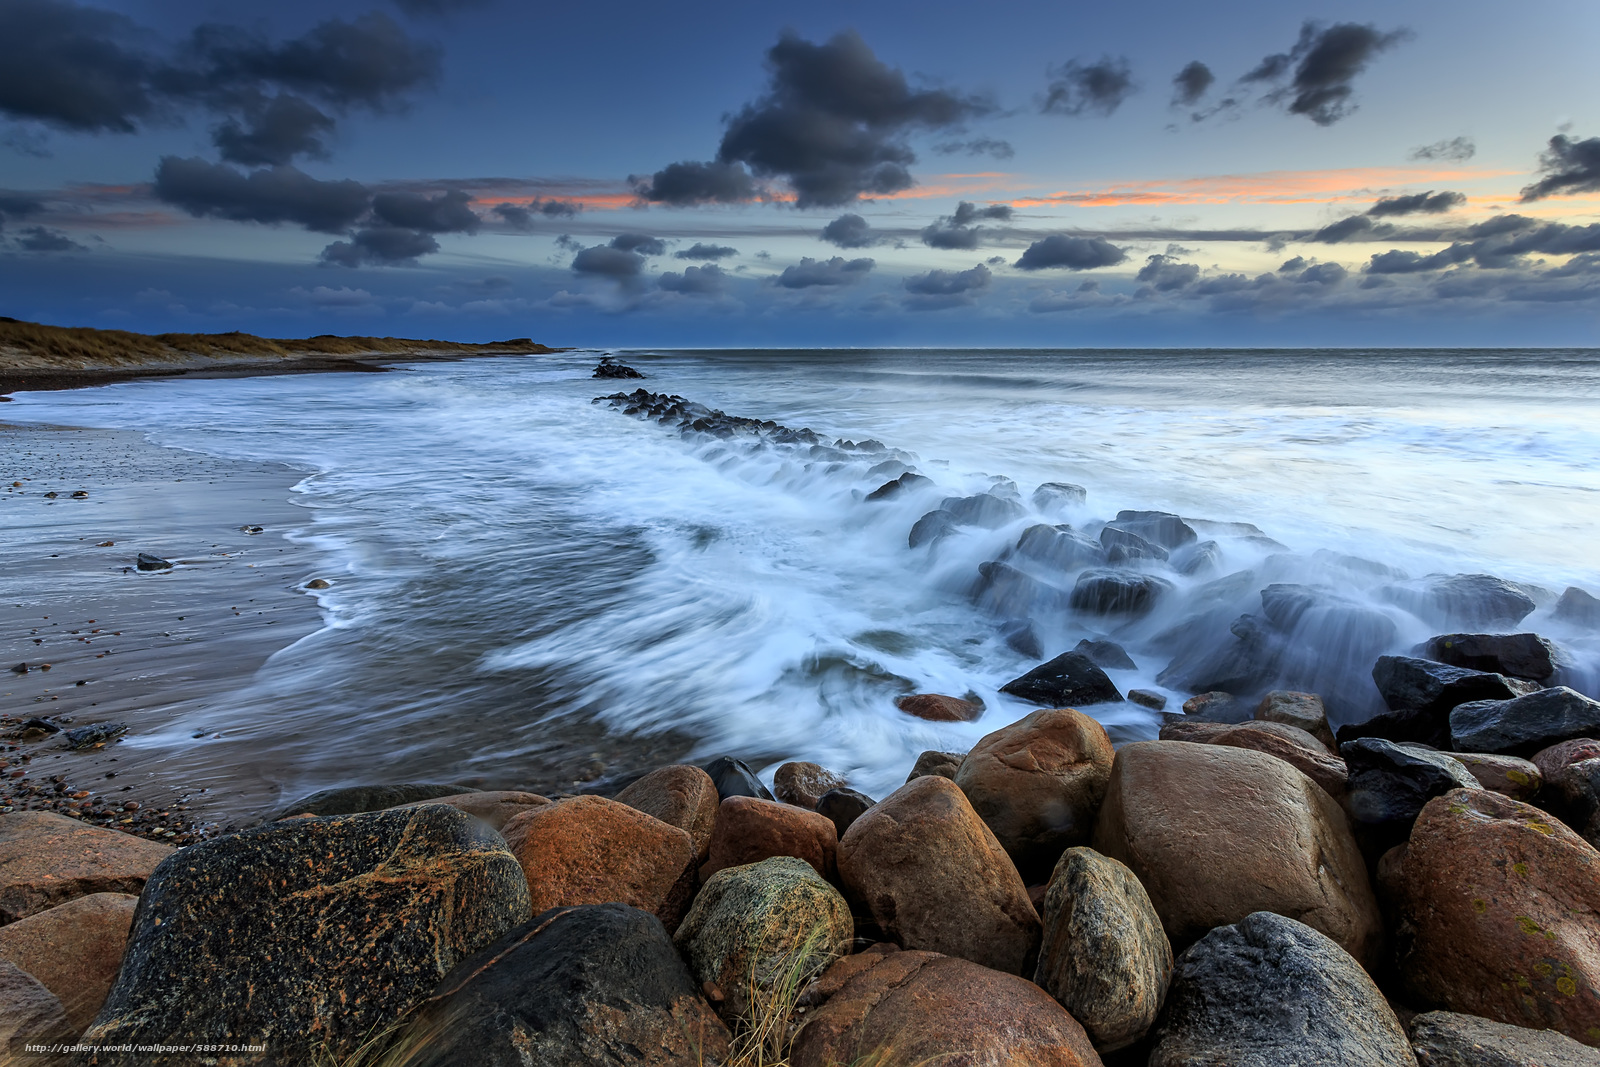 водители картинка морские камушки и волны самокате